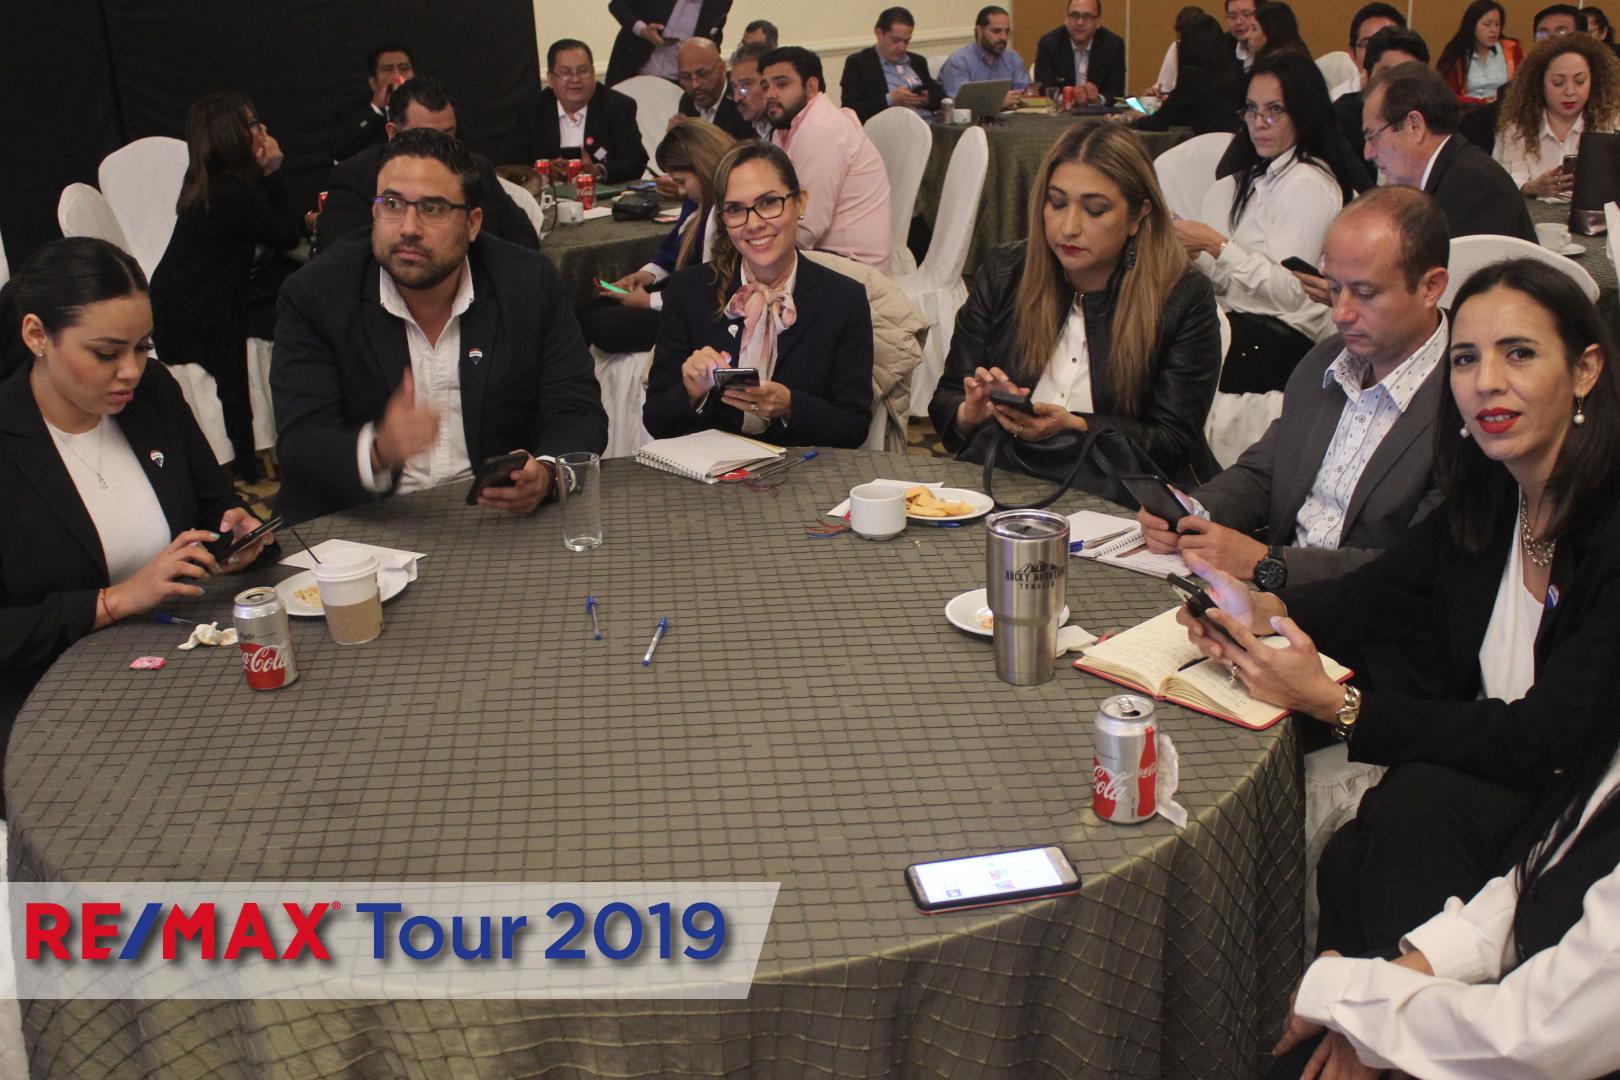 02_REMAX_Tour_Tampico_Tamaulipas_2019